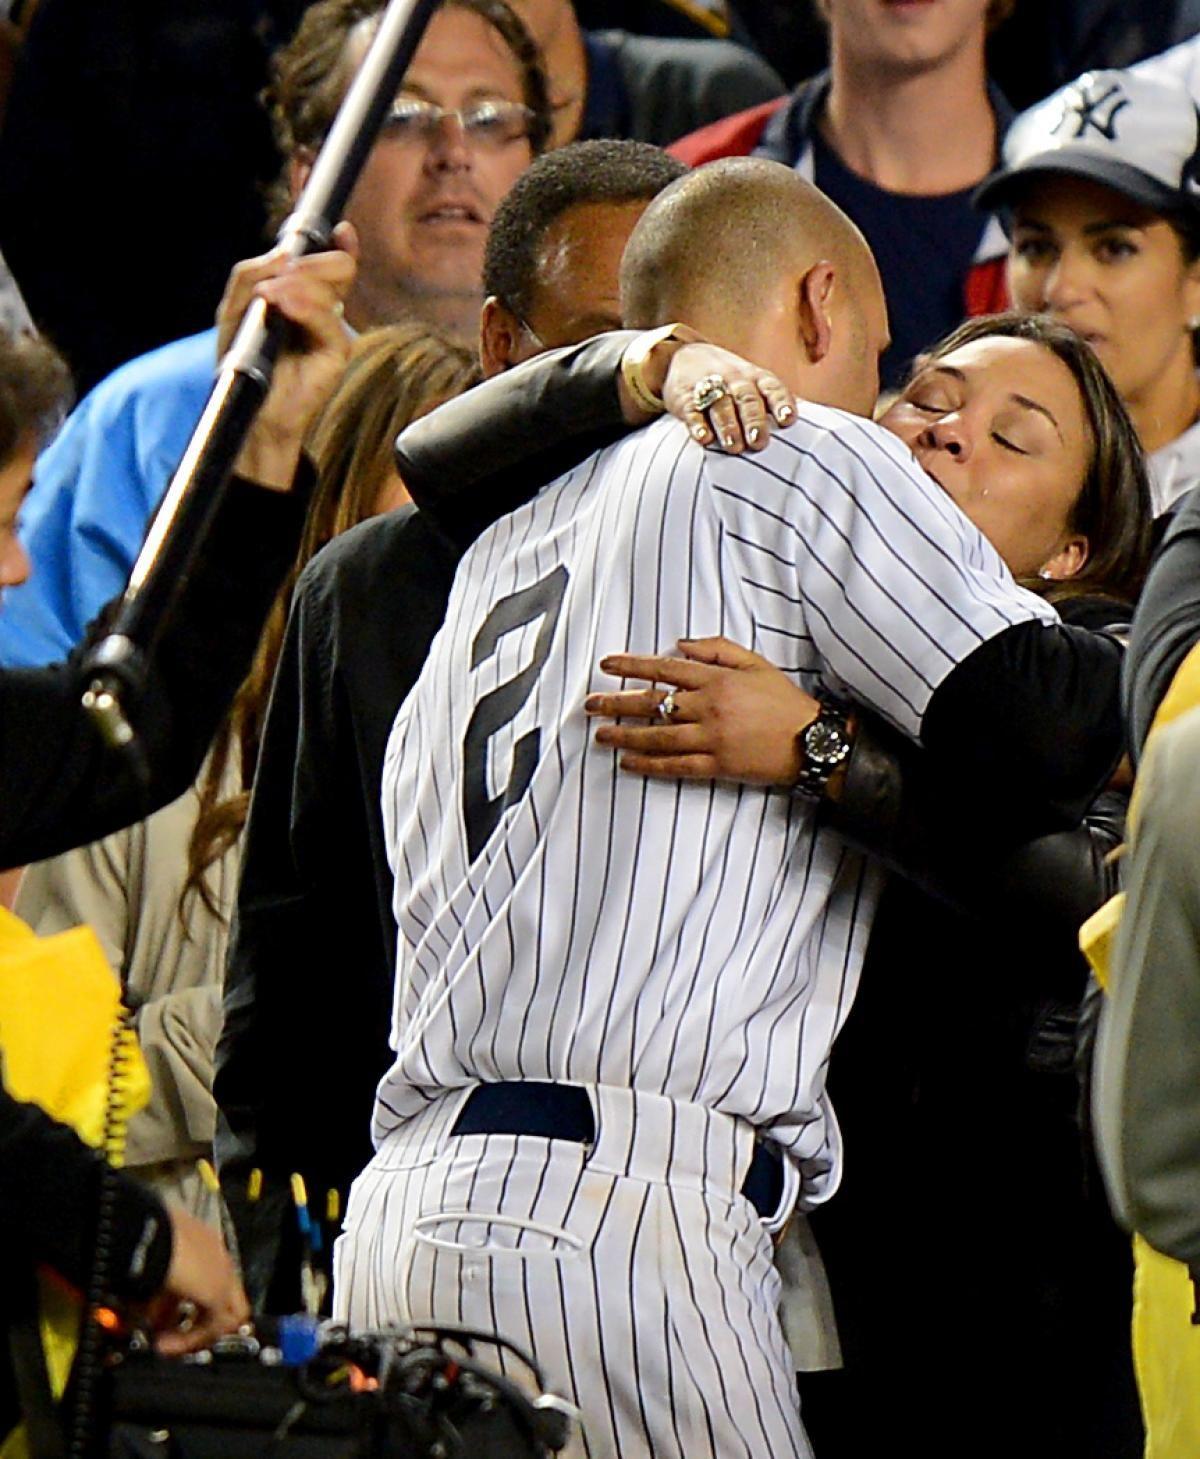 Derek Jeter Delivers Win In Emotional Yankee Stadium Farewell New York Yankees Baseball Derek Jeter Yankees Baseball